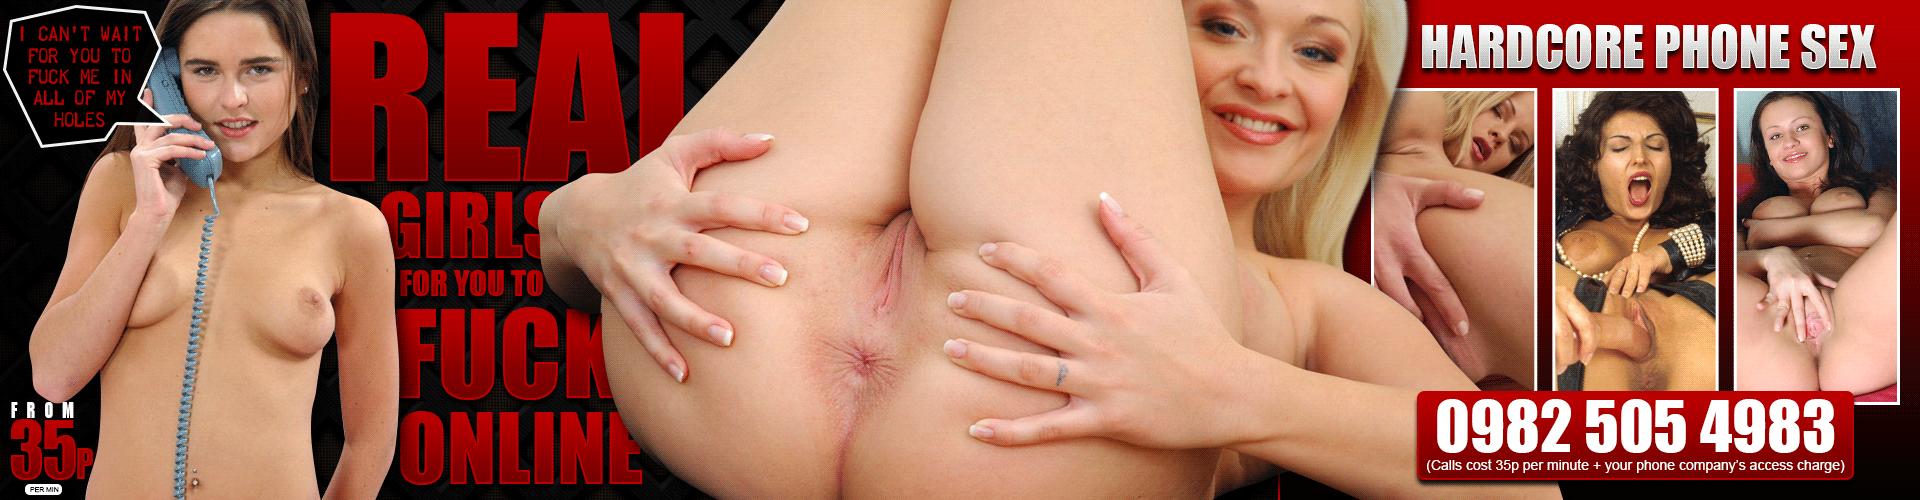 website-phone-sex-header